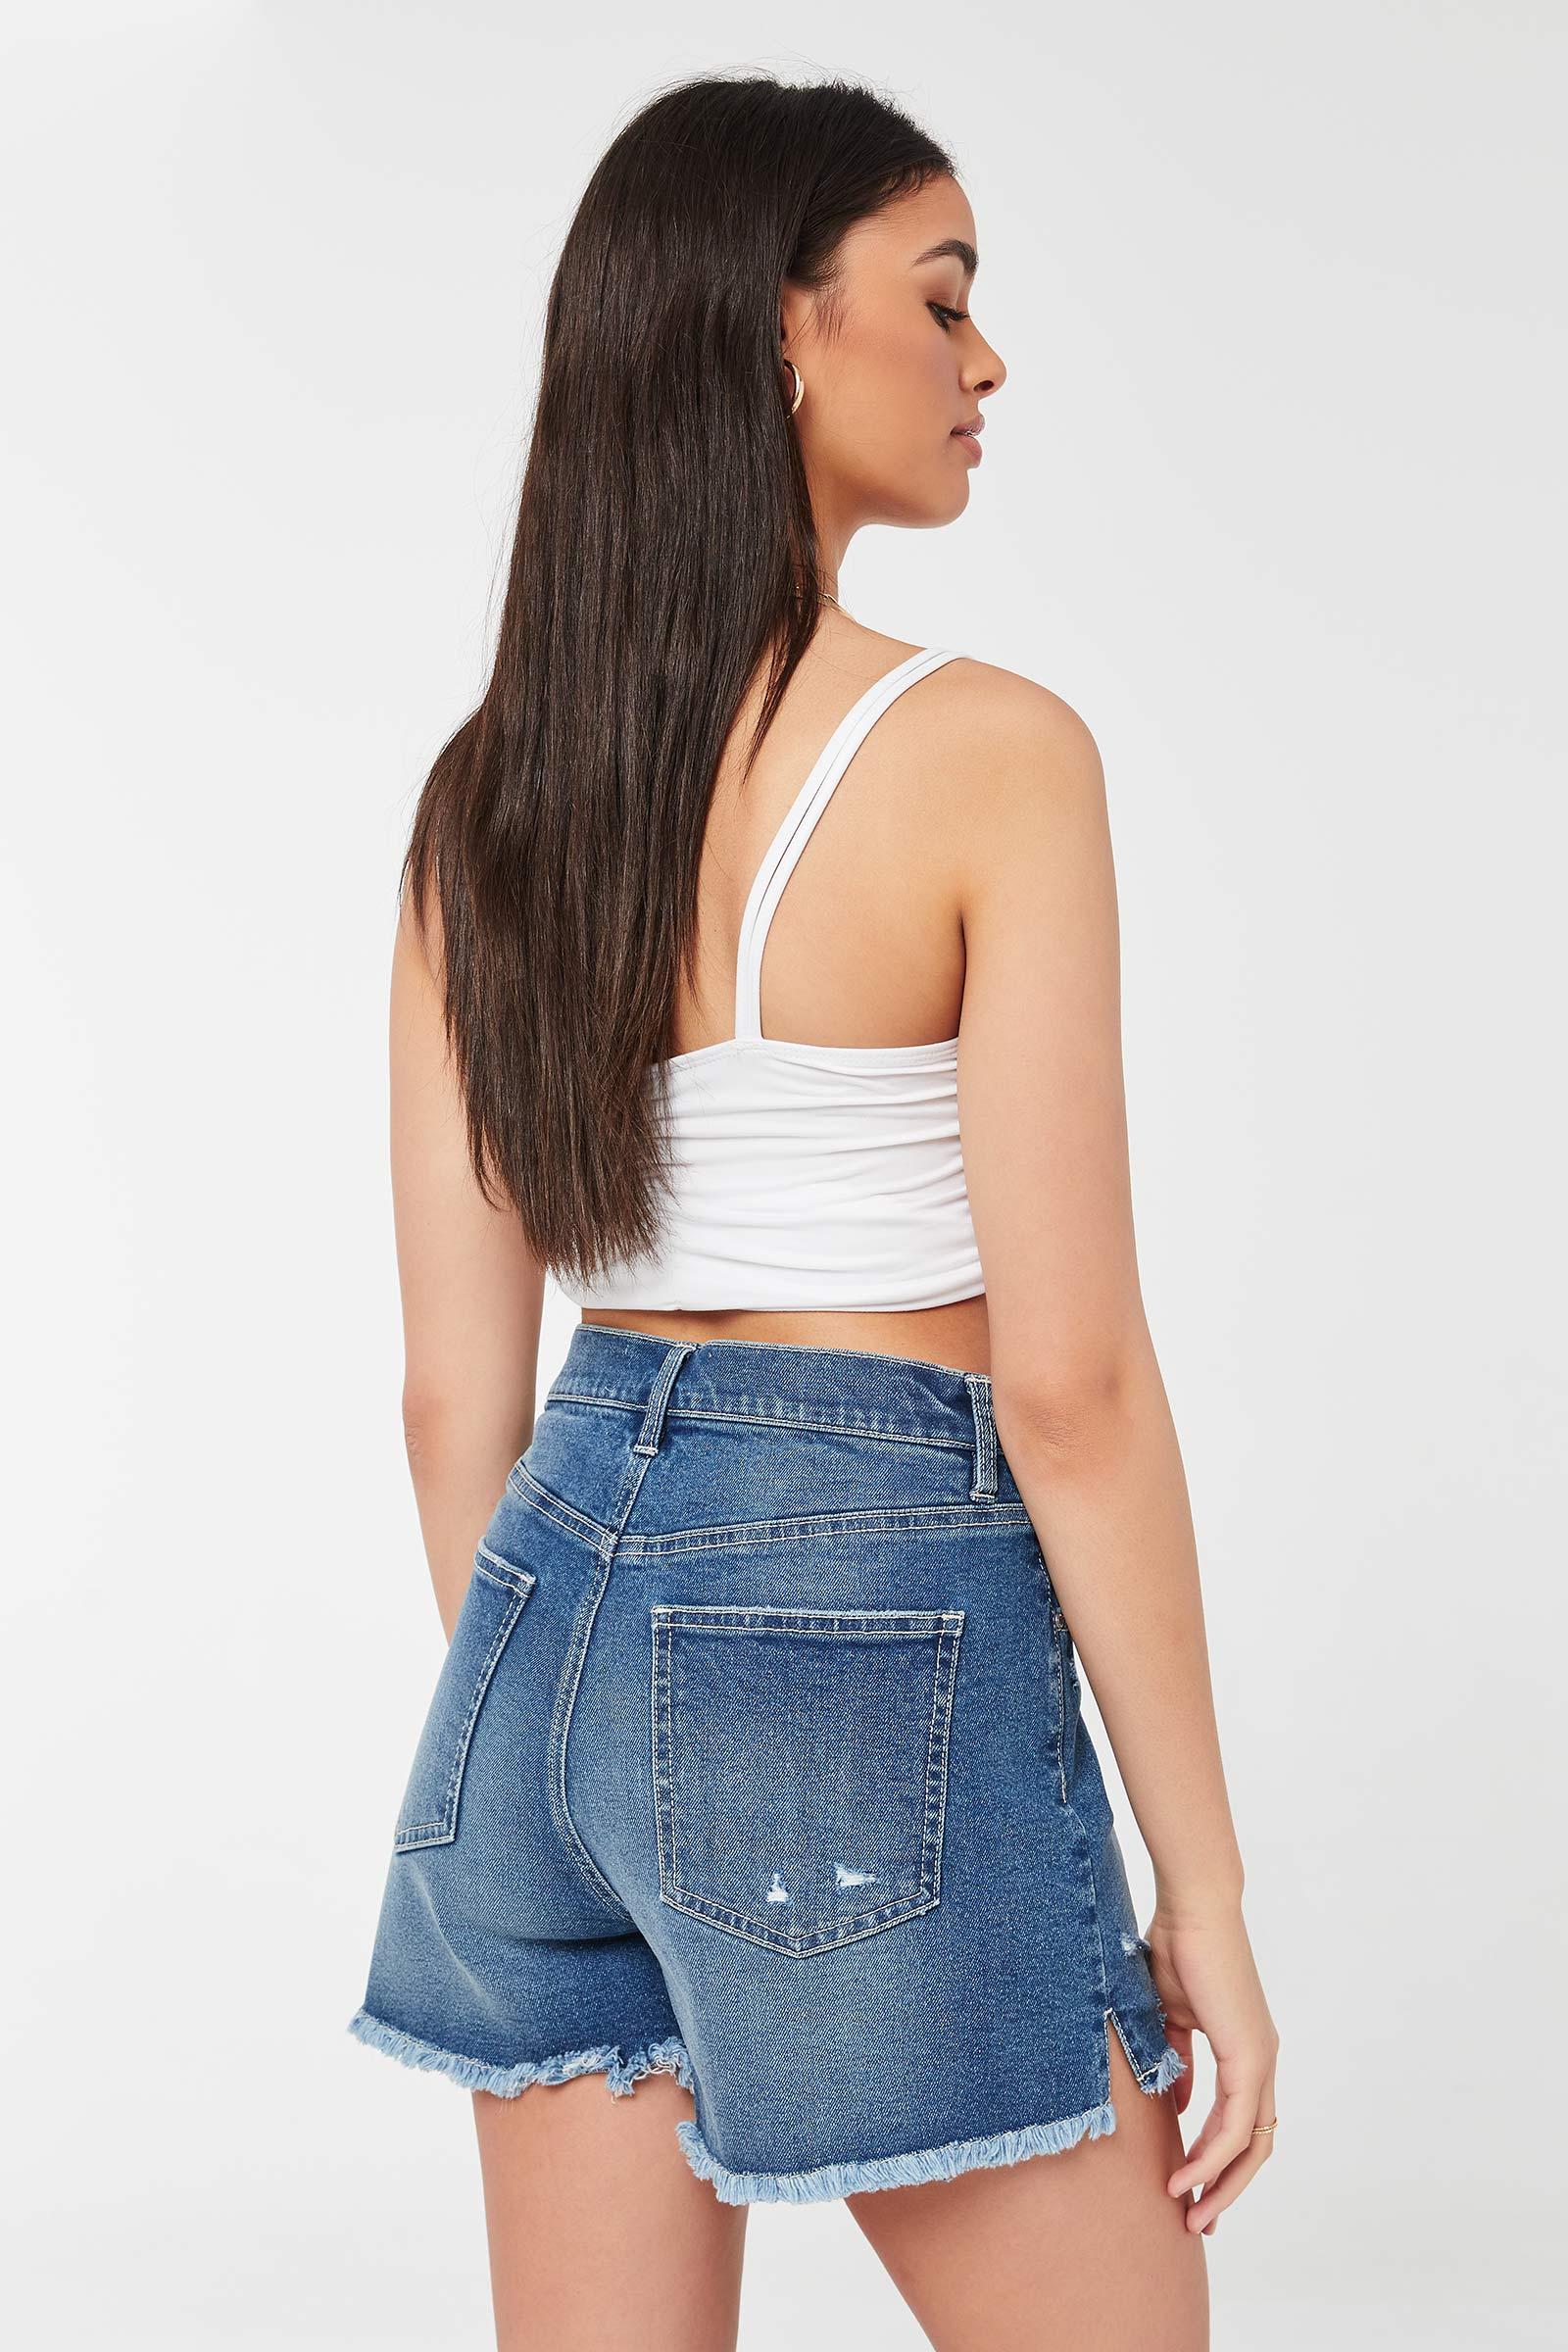 Ripped Edge Jean Shorts